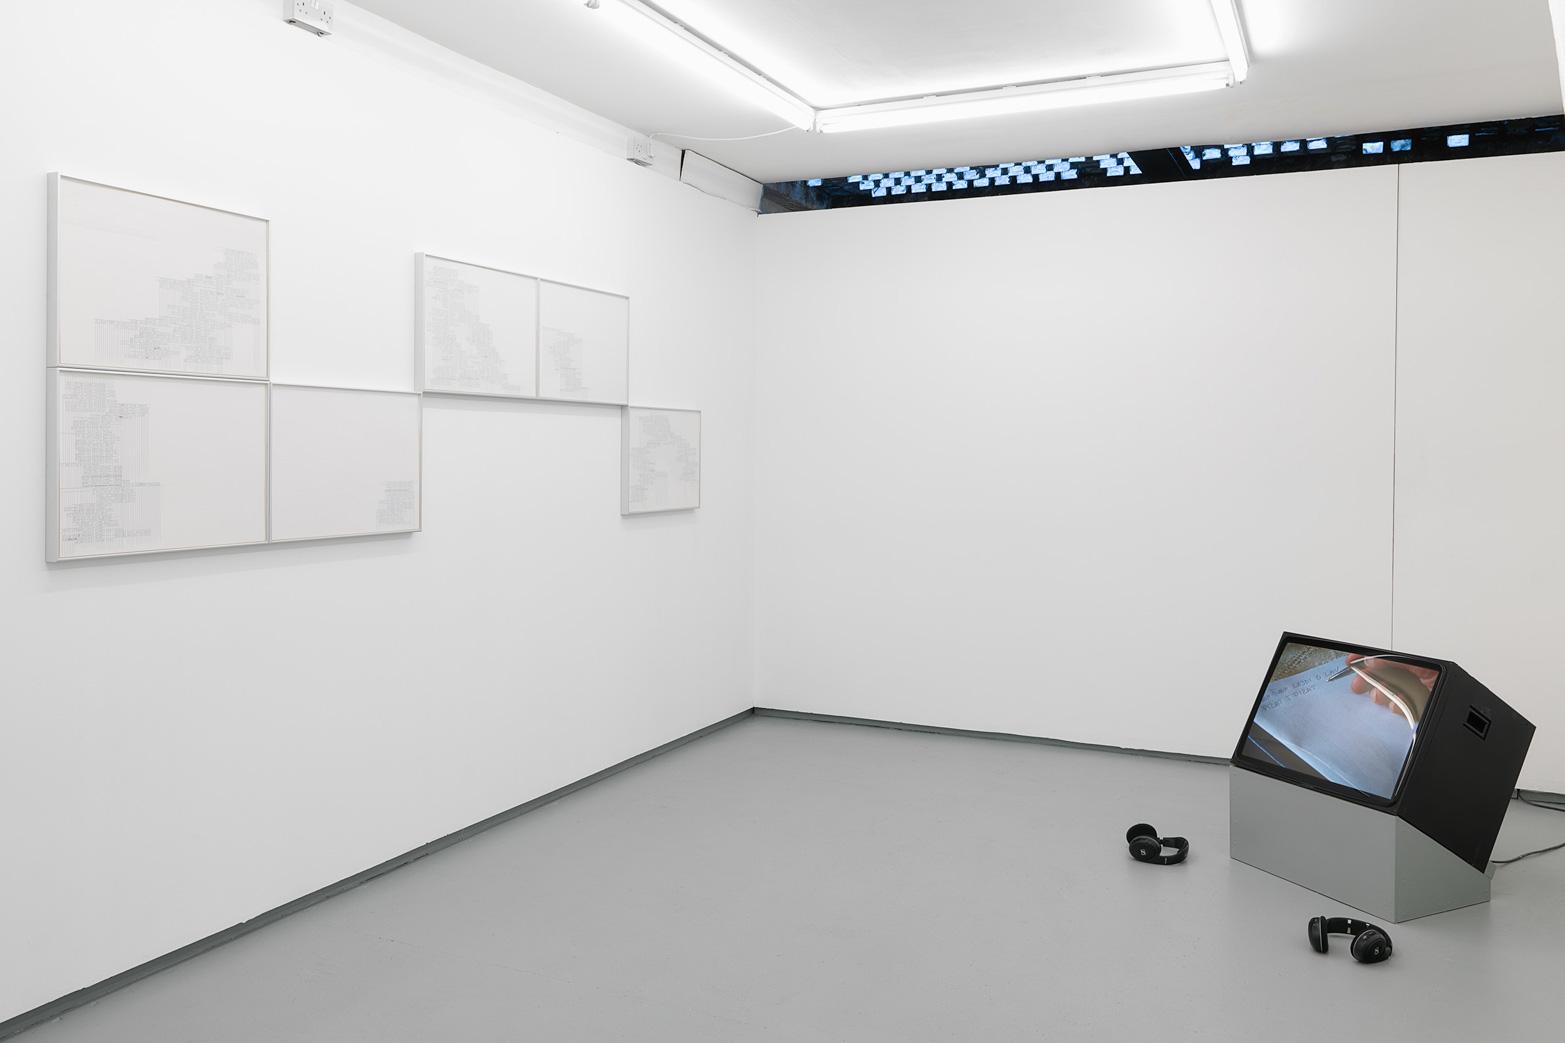 Anna Barham, Ampler Tongue Transit, 2012; Katarina Zdjelar, Shoum, 2009. Courtesy of Tenderpixel, Arcade, London and SpazioA, Pistoia.